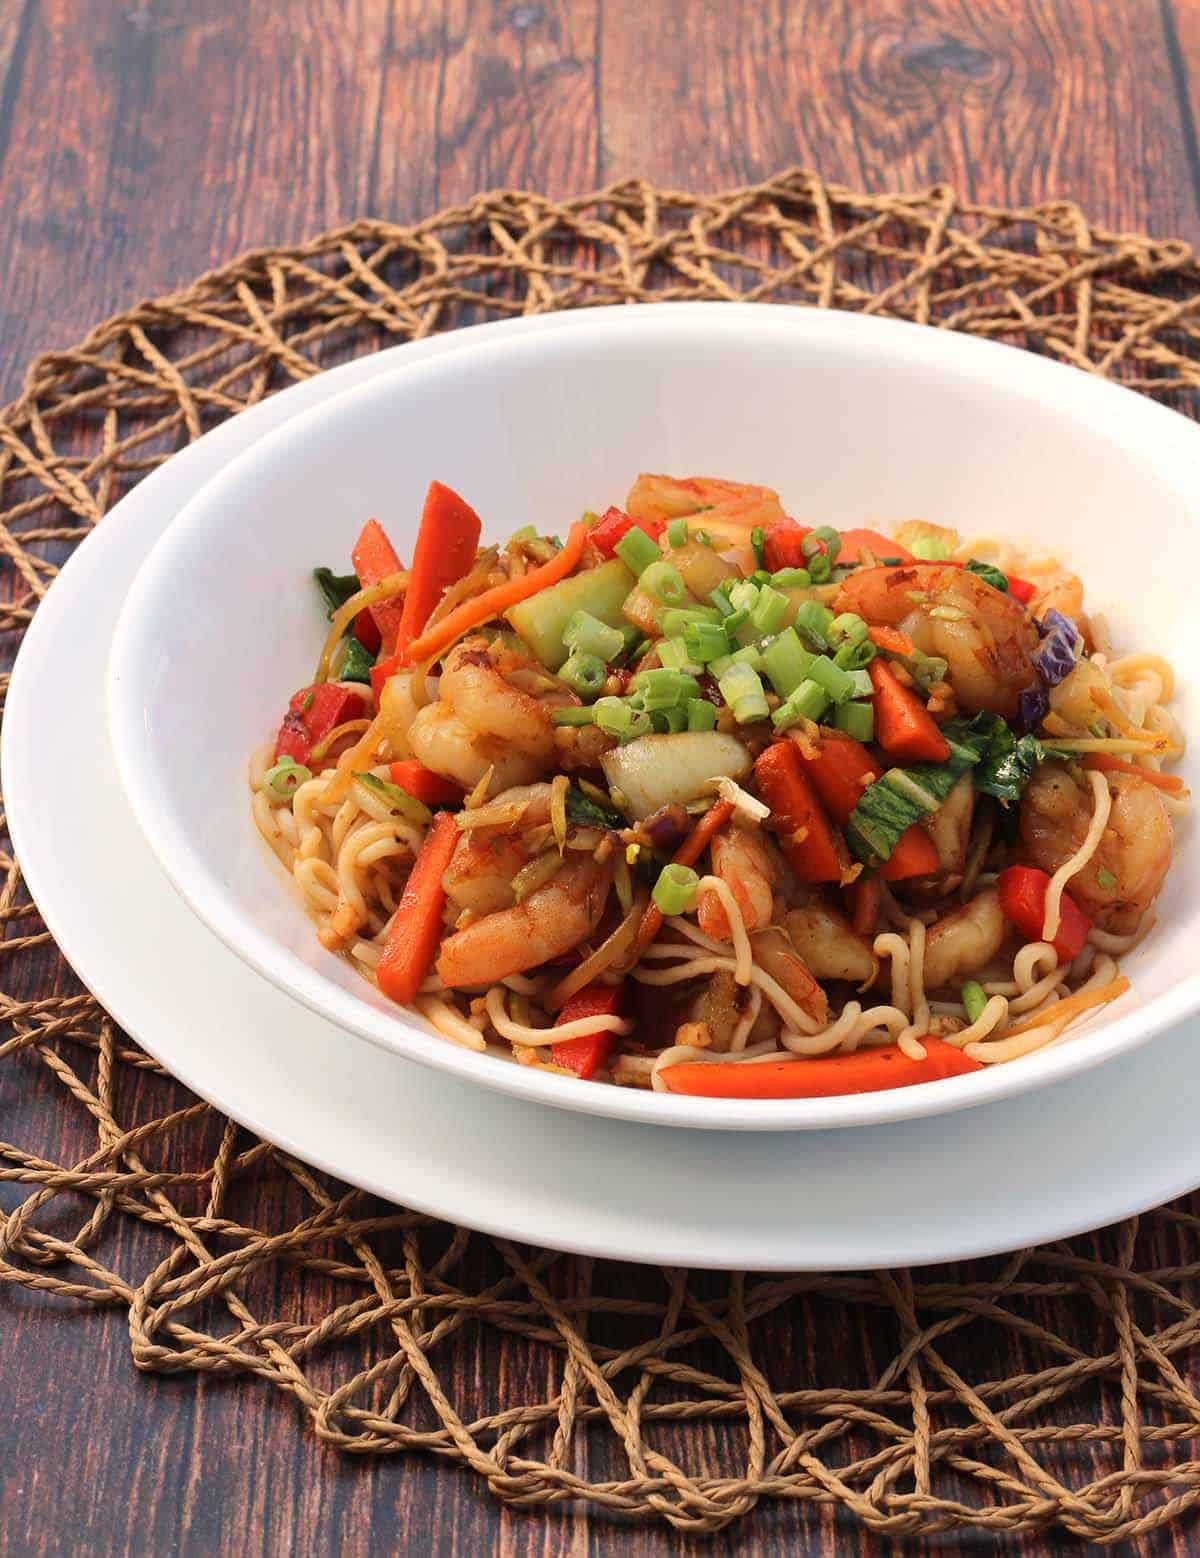 Shirataki Noodles with Shrimp Stir-Fry in a white bowl